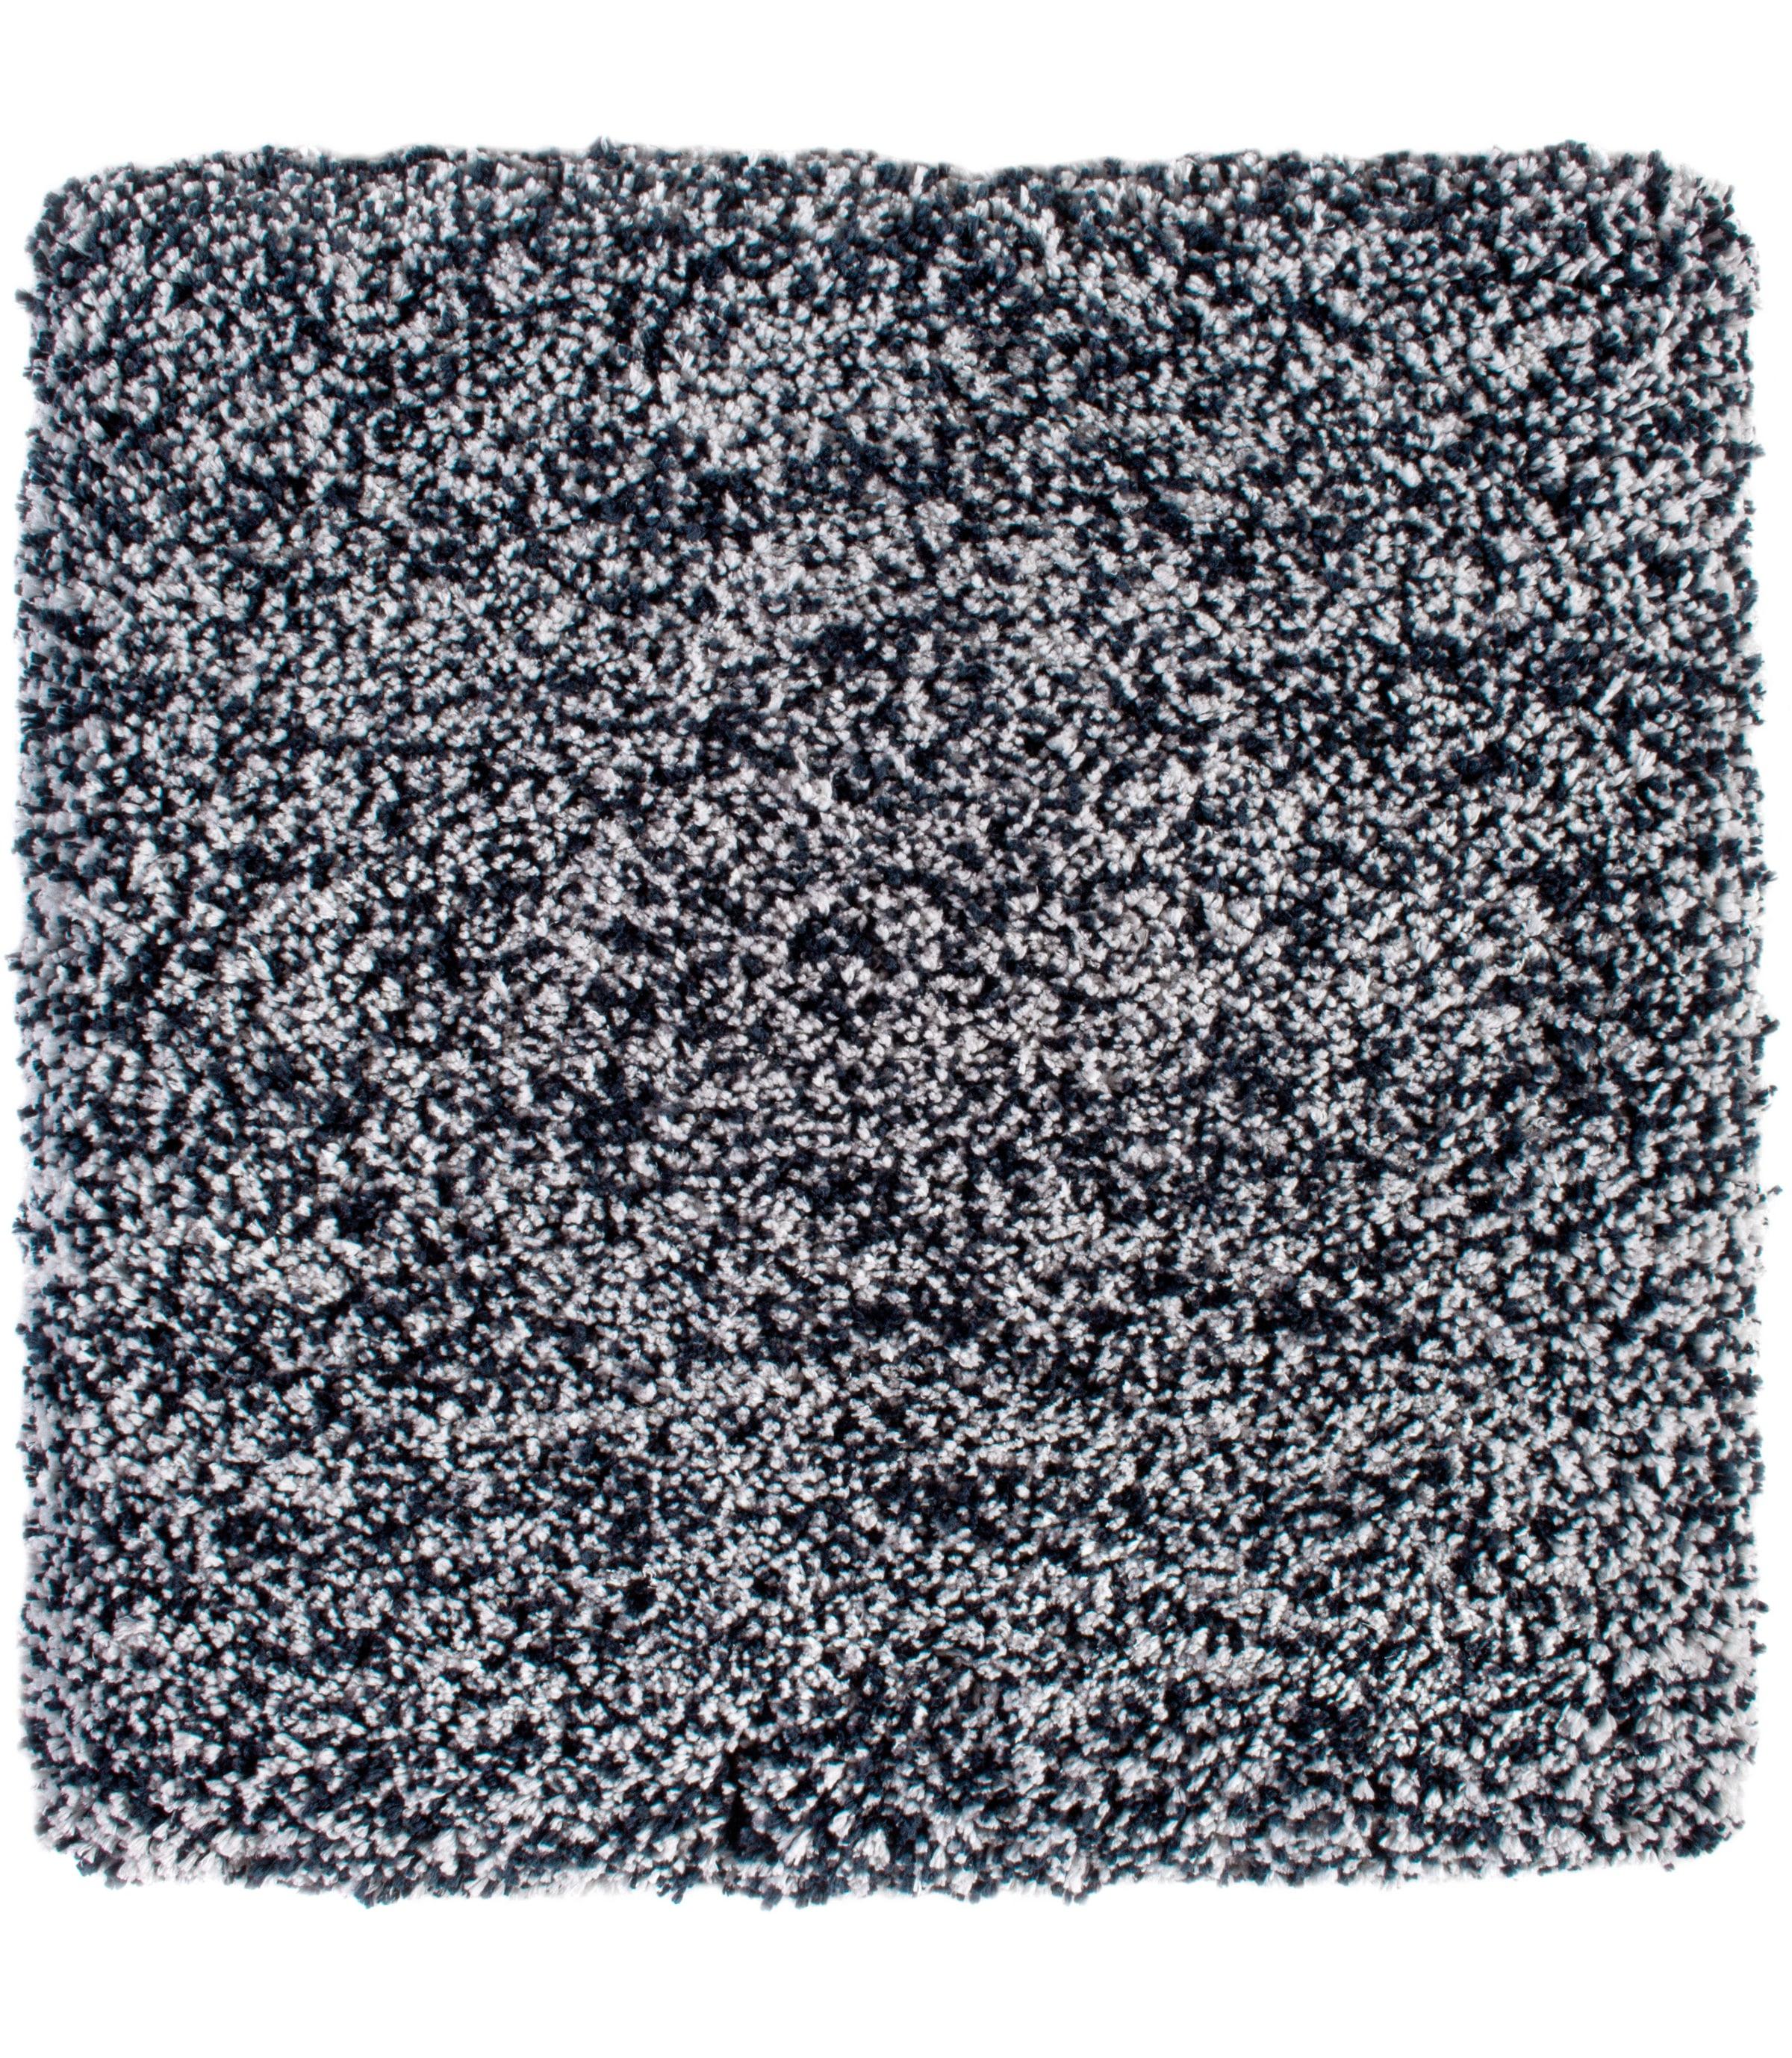 Image of Al MANO Teppichfliese »Piazza«, 4x 40x40 cm